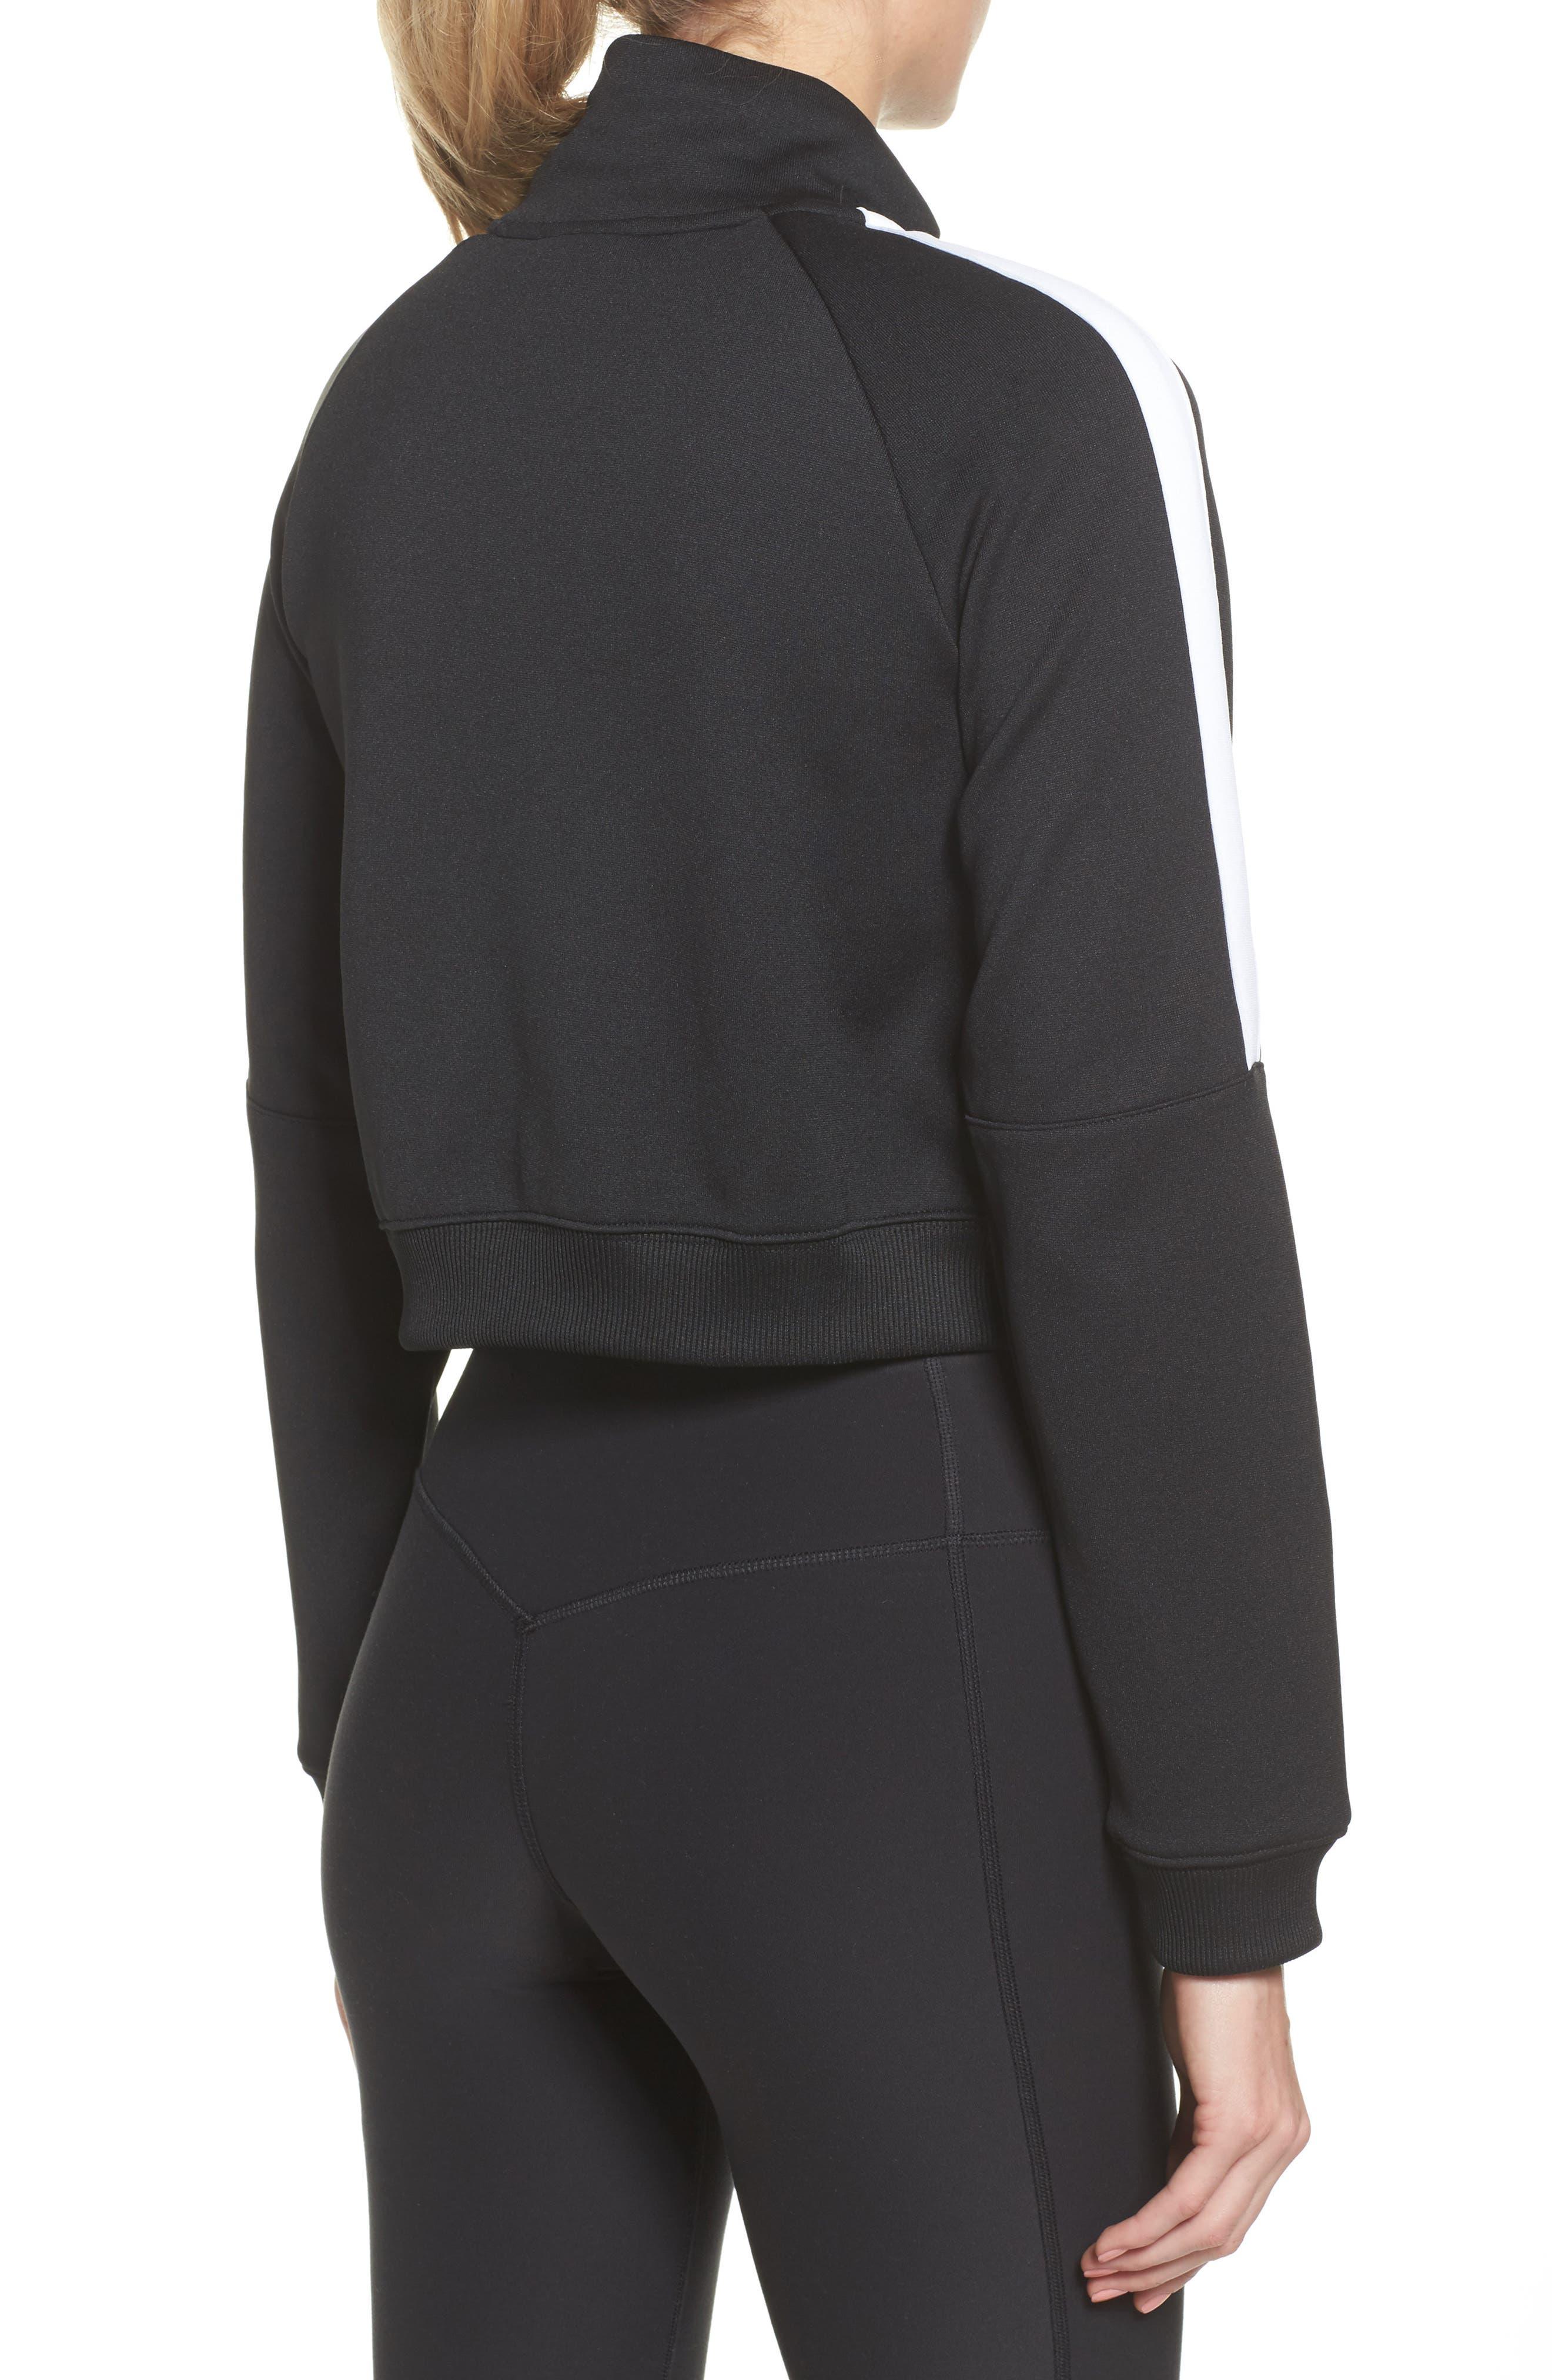 Sportswear N98 Jacket,                             Alternate thumbnail 4, color,